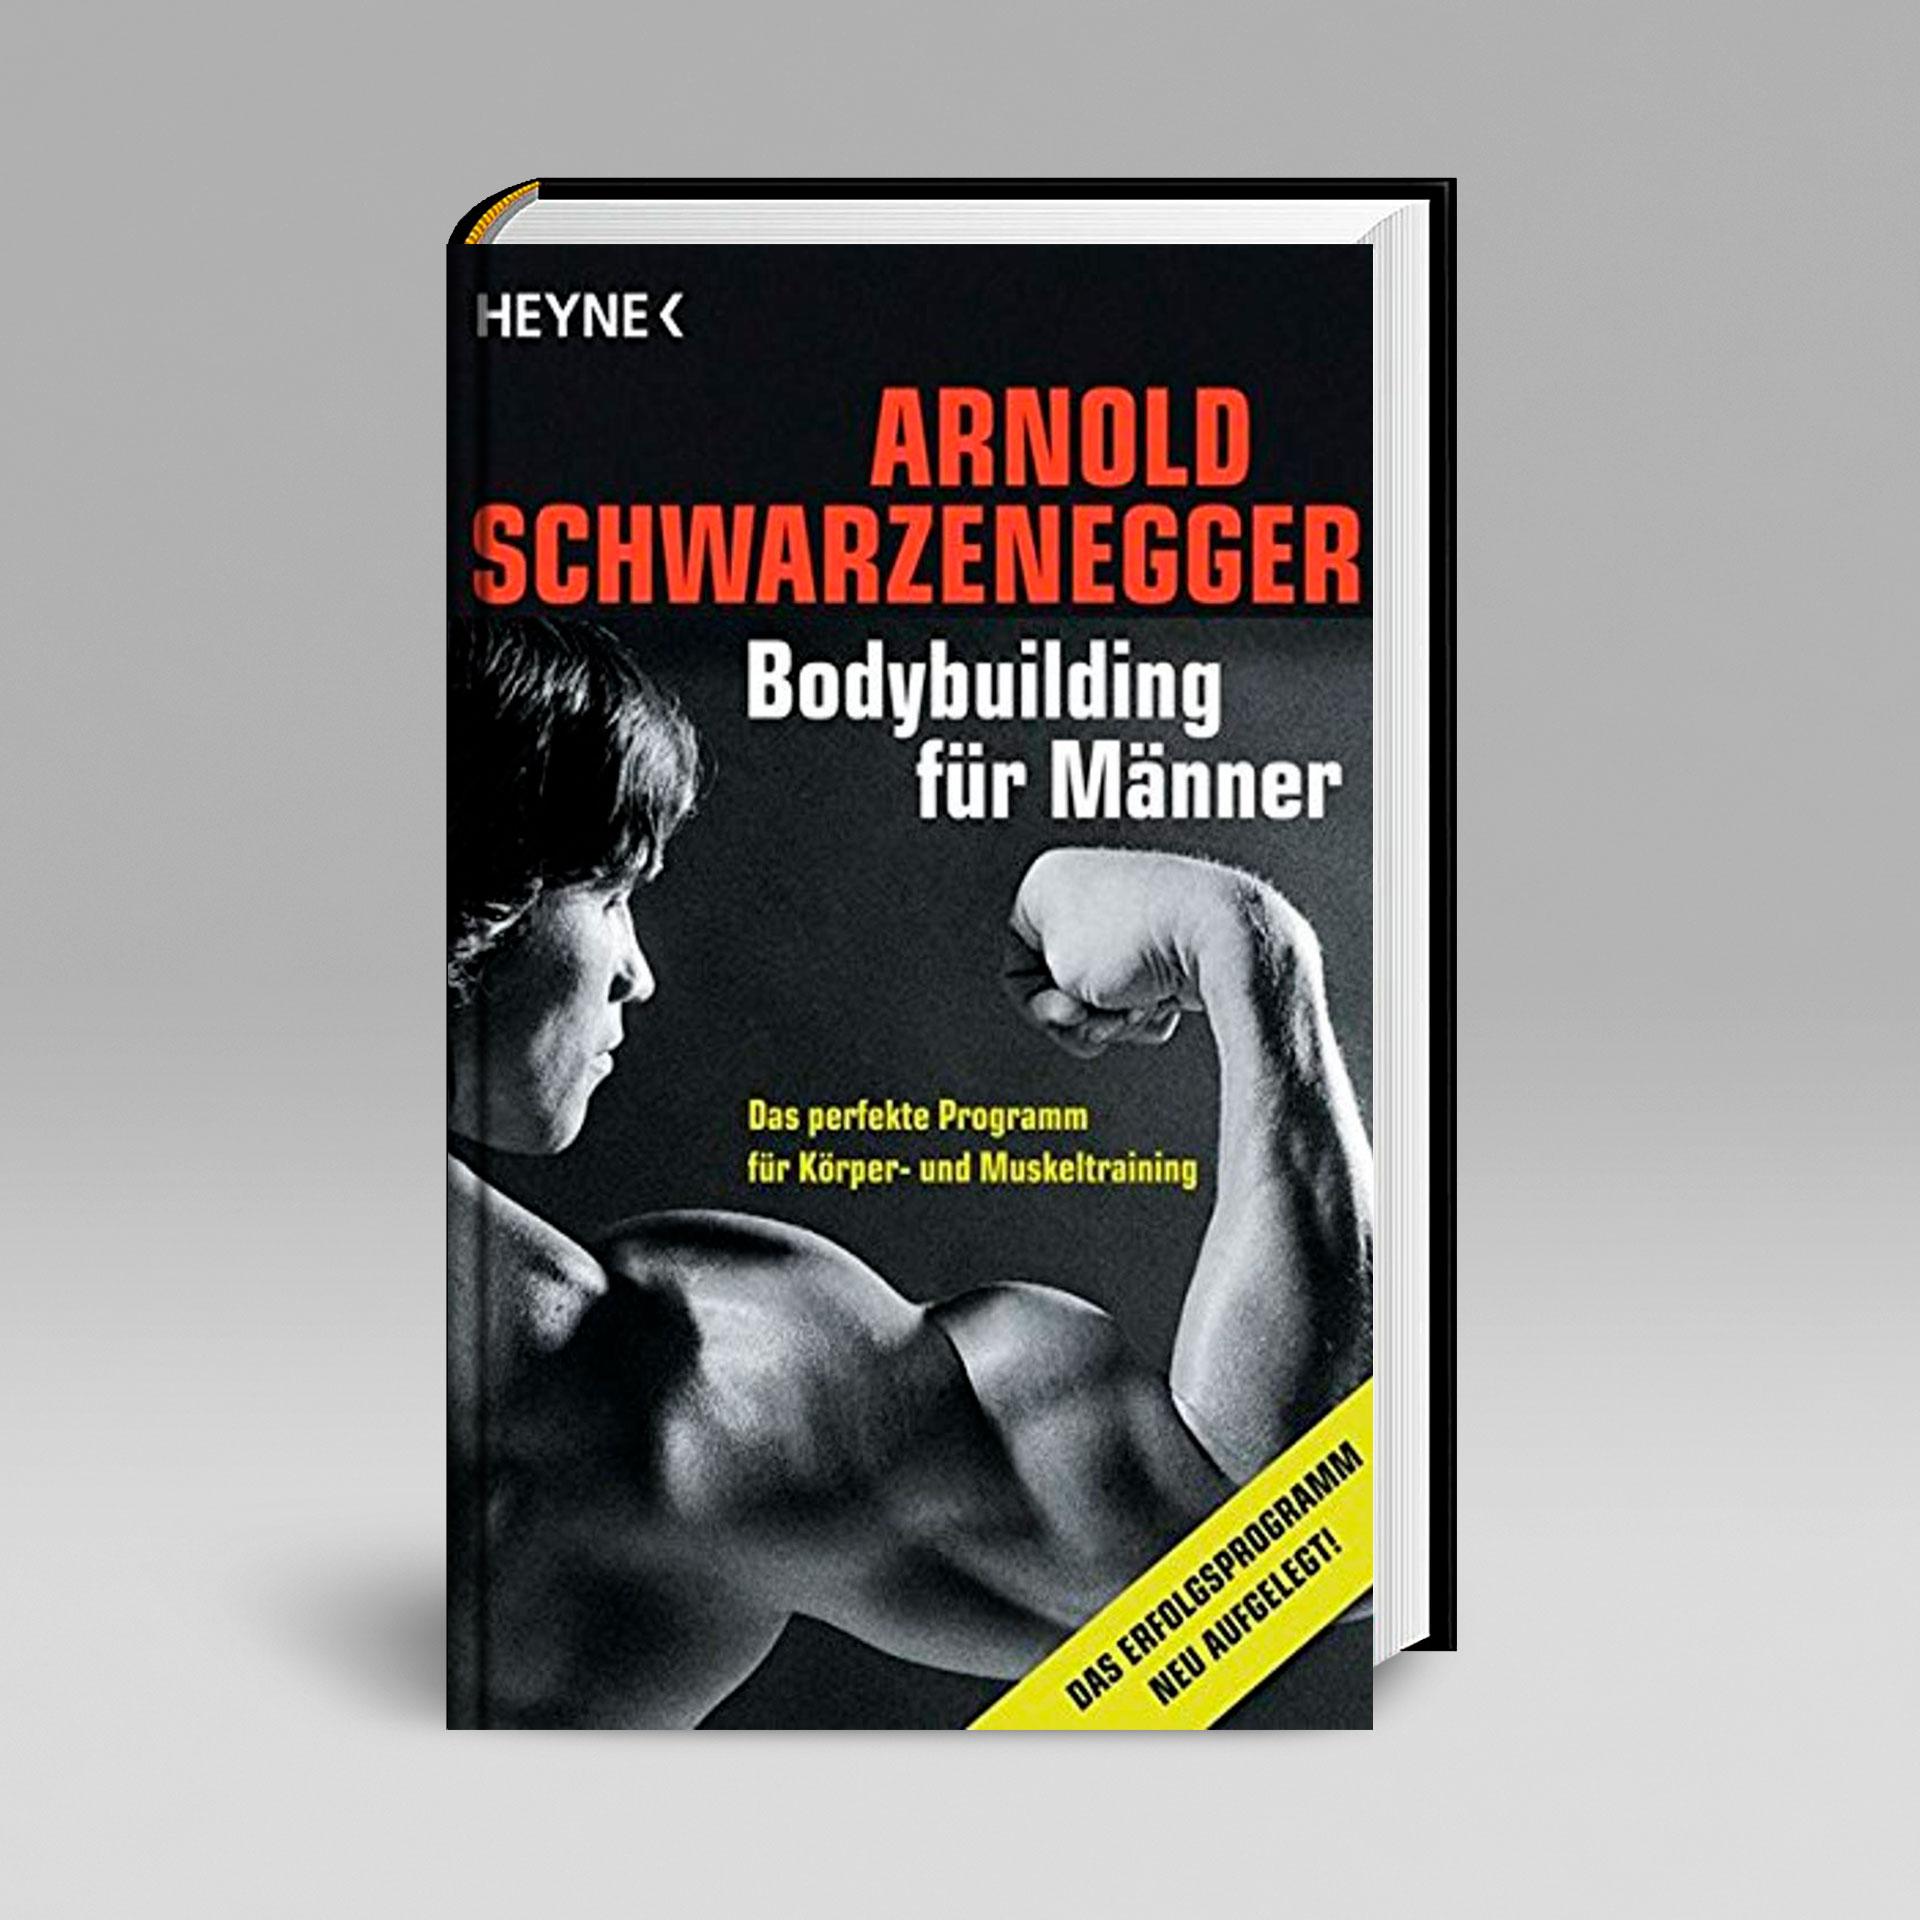 buch bodybuilding f r m nner arnold schwarzenegger museum. Black Bedroom Furniture Sets. Home Design Ideas